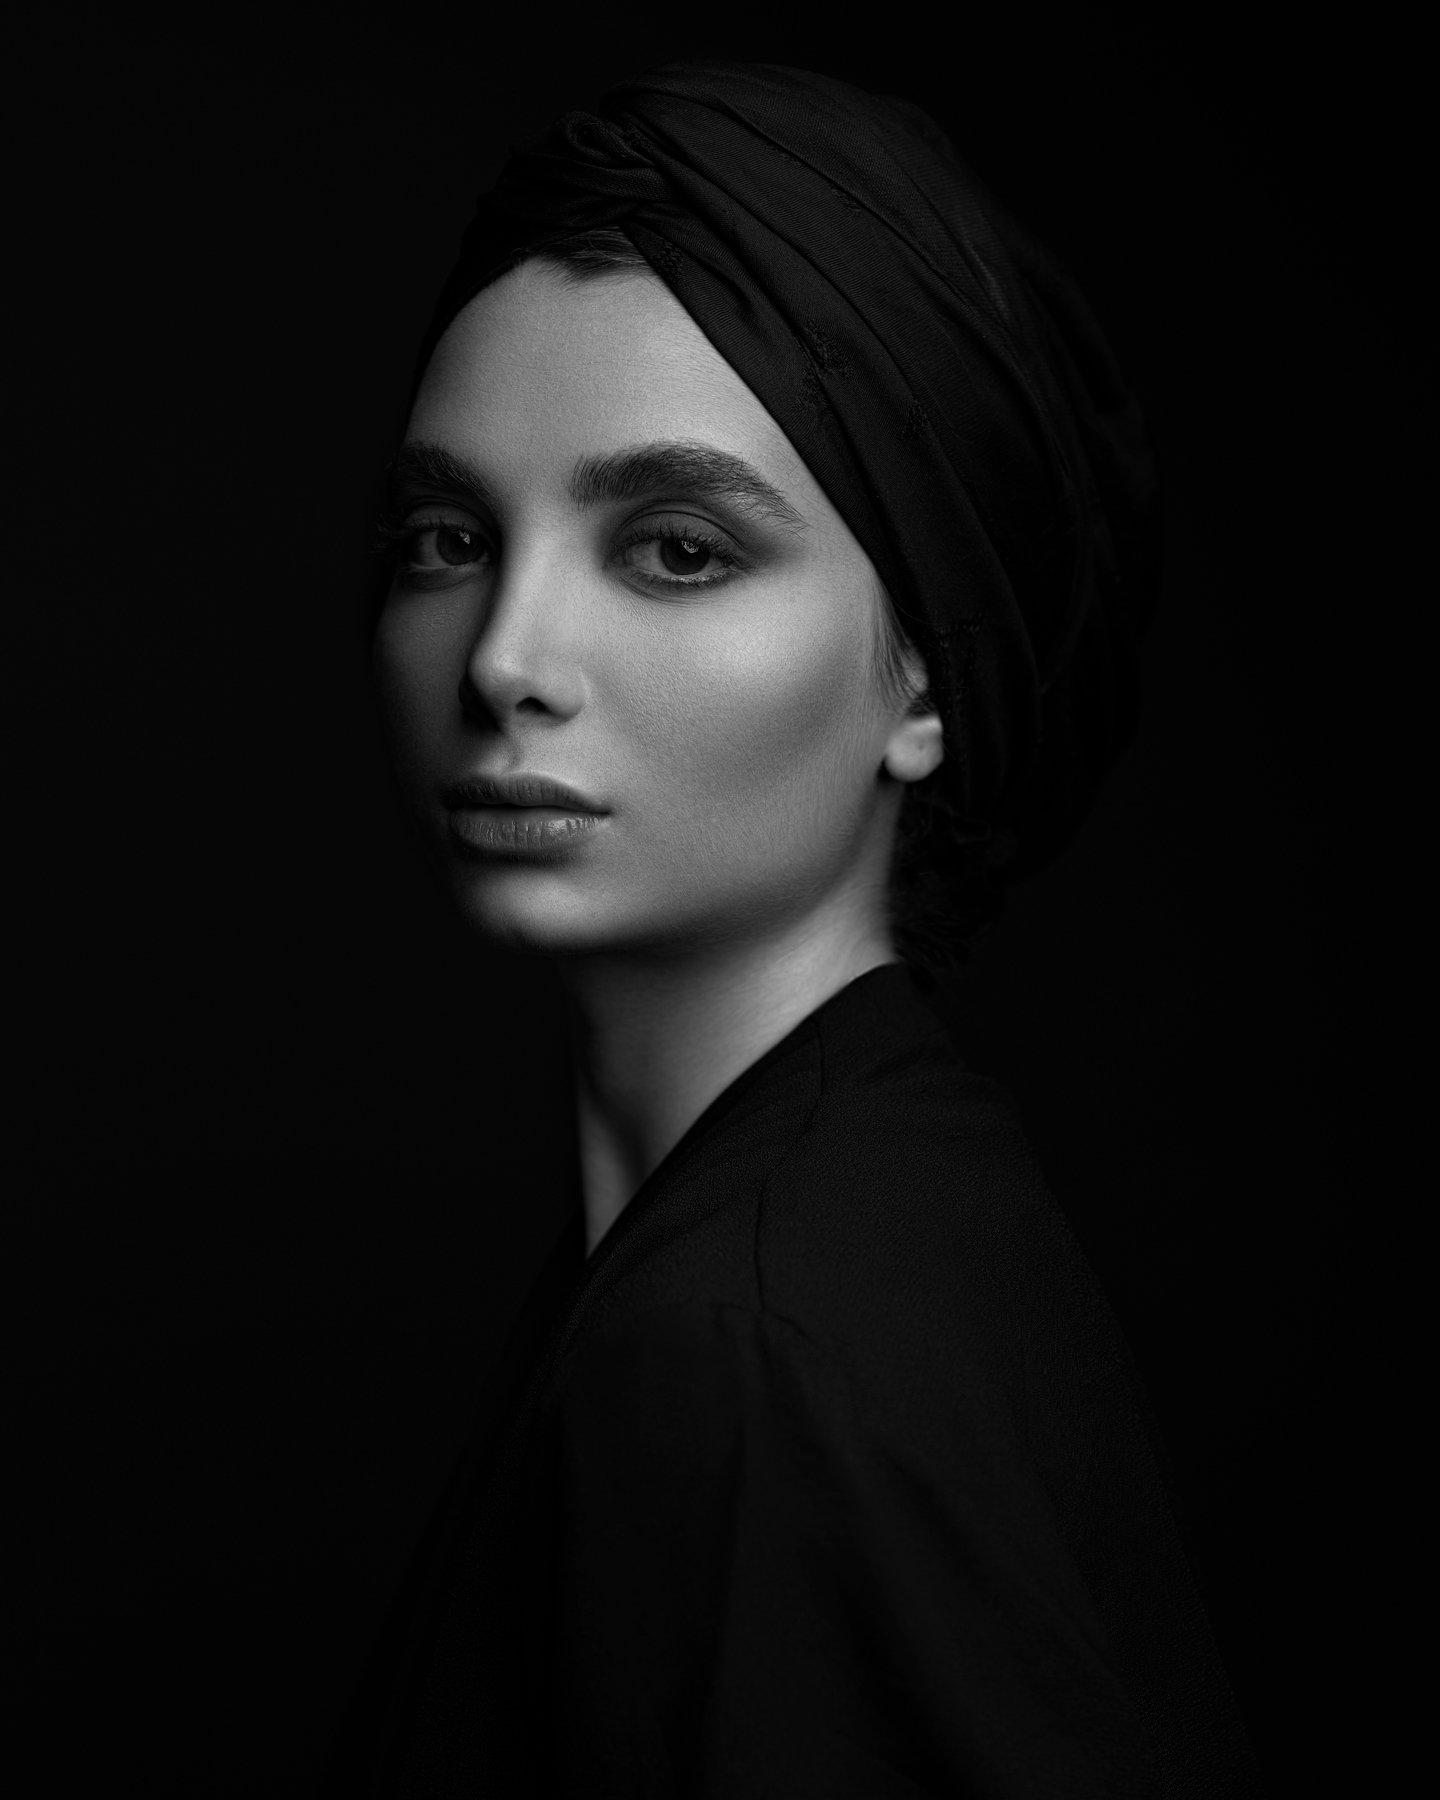 portrait, girl, eyes, lips, beautiful, studio, glamour, cute, pretty, style, eye, model, face, makeup, young, skin, headshoot, MahDan Alizadeh